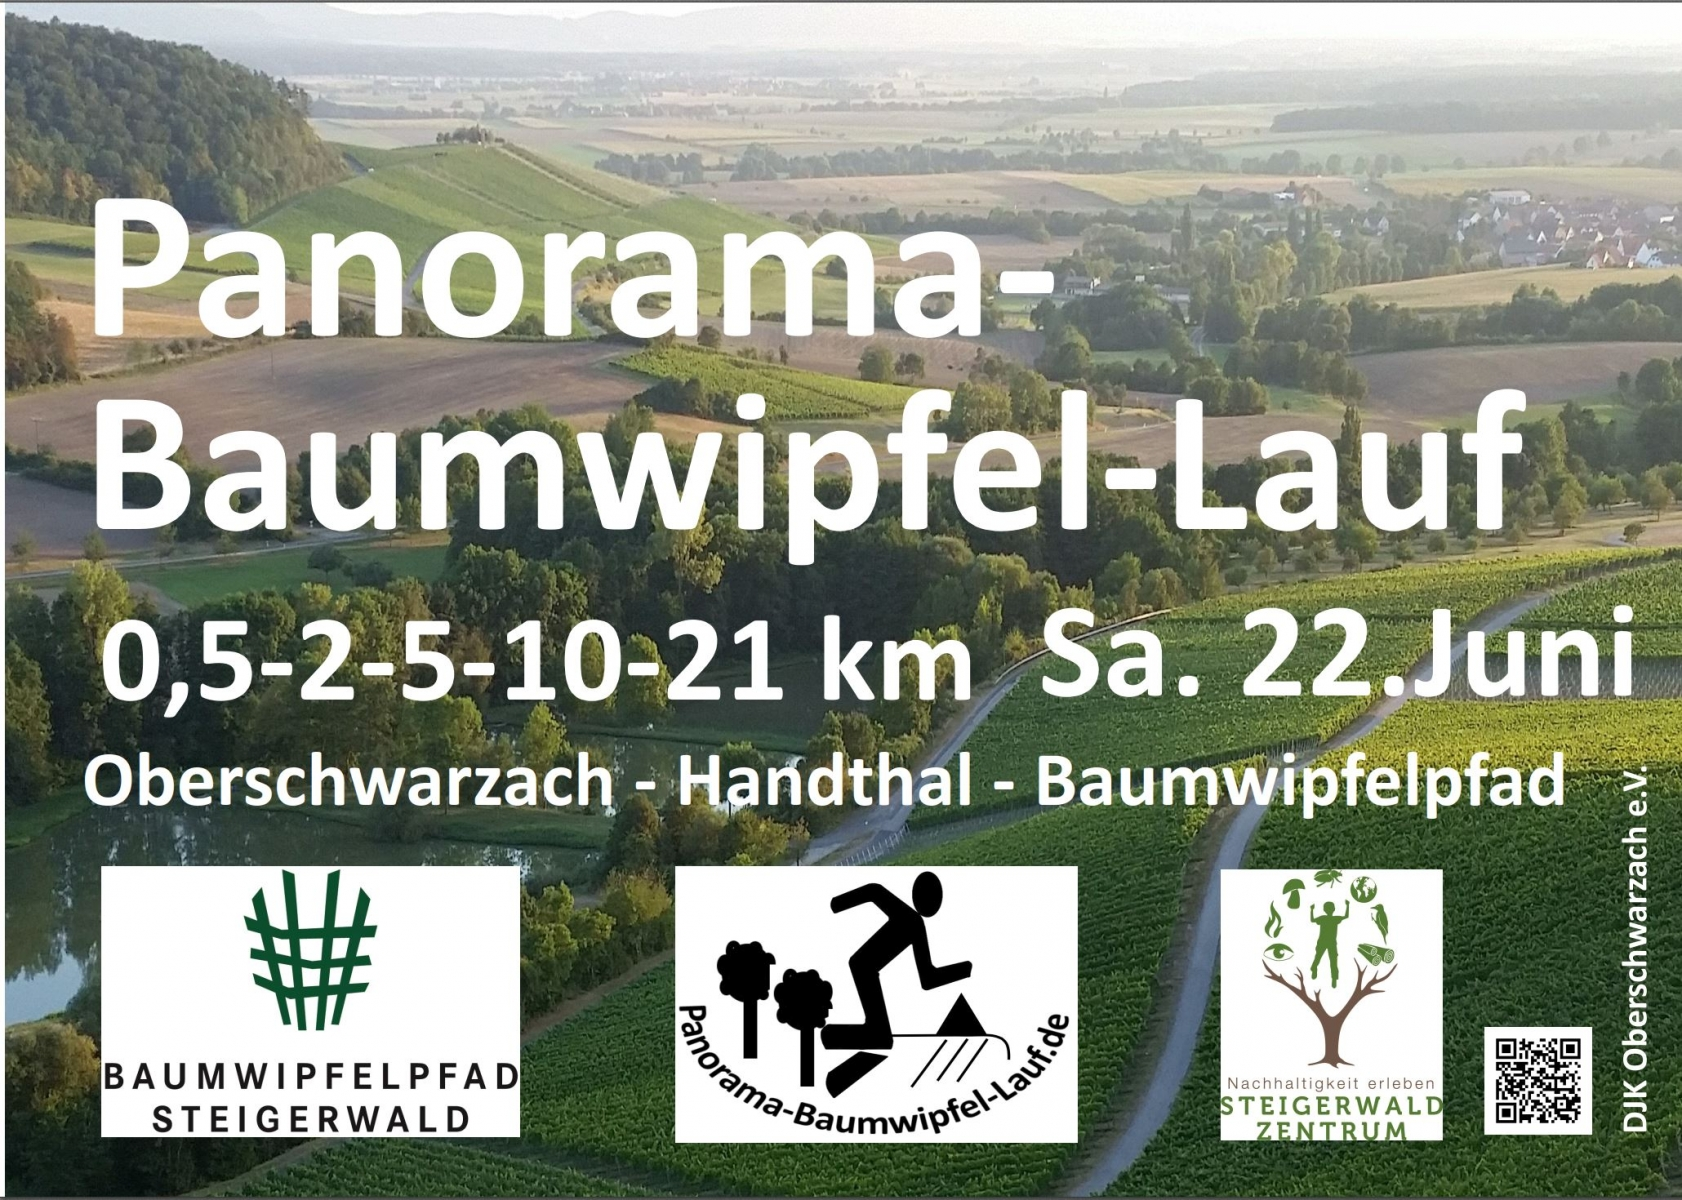 Panorama-Baumwipfel-Lauf-05-21km-180906